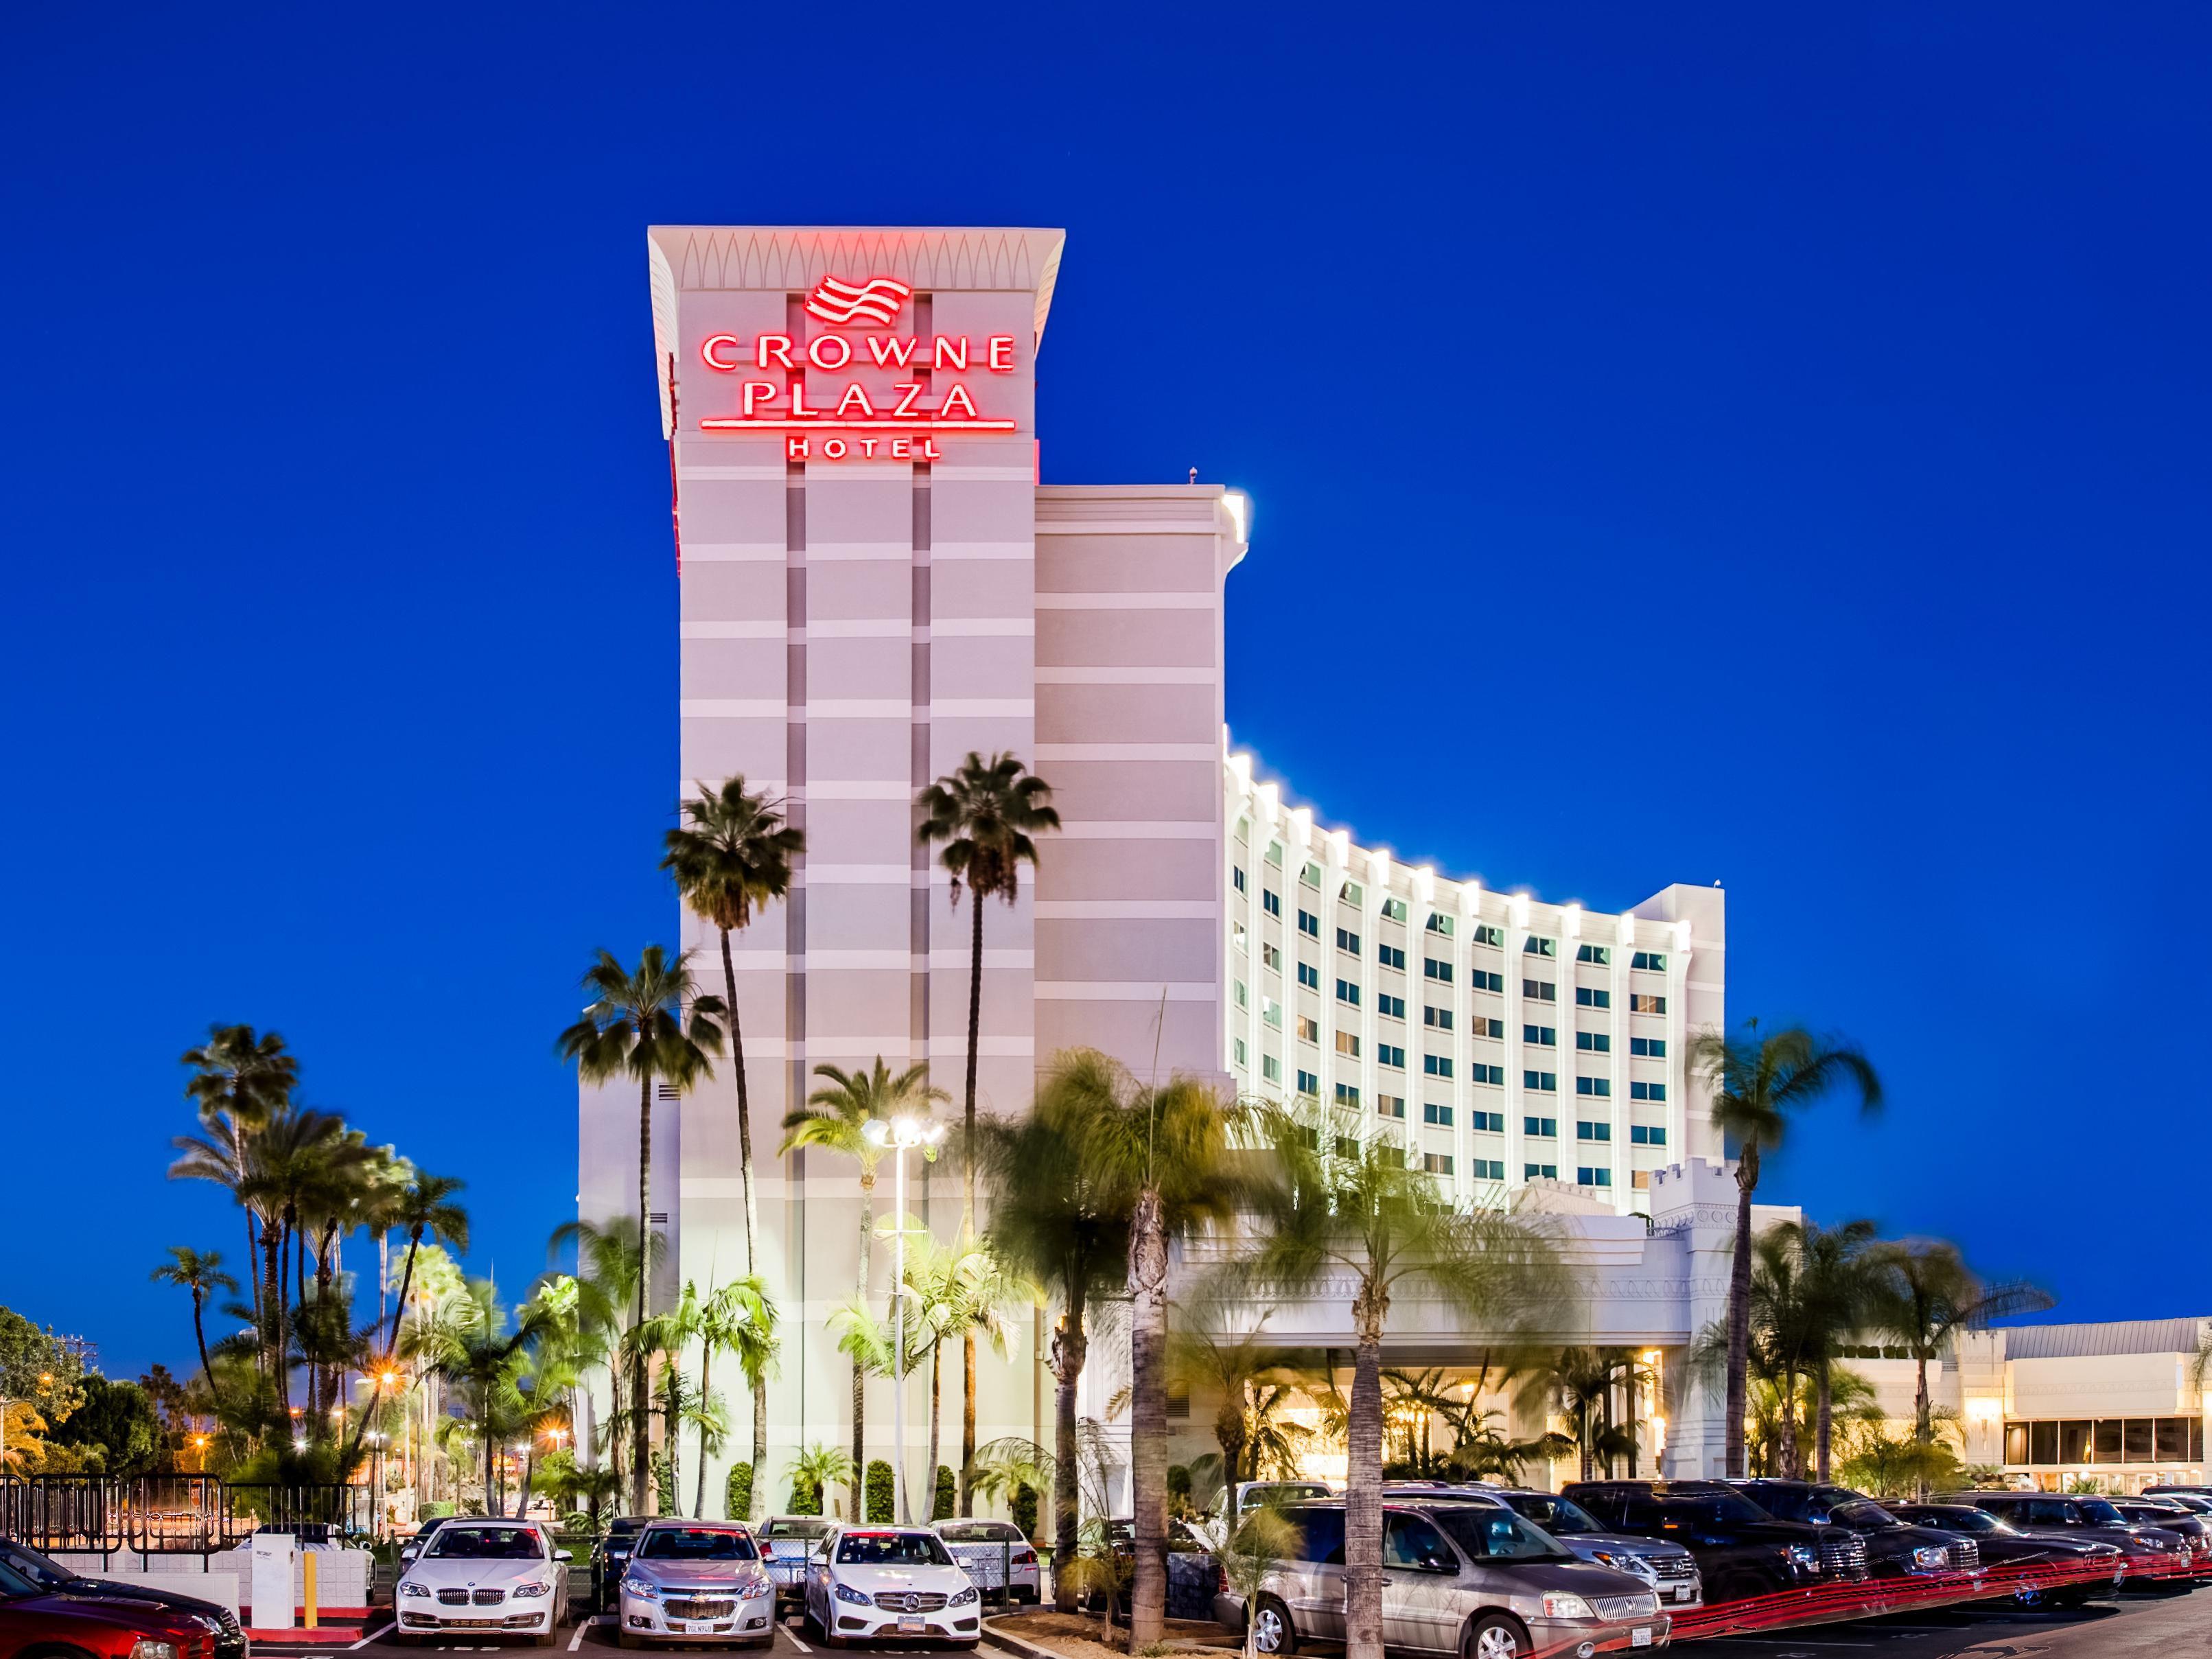 Angeles casino los near renaissance aruba resort u0026 casino marina hotel